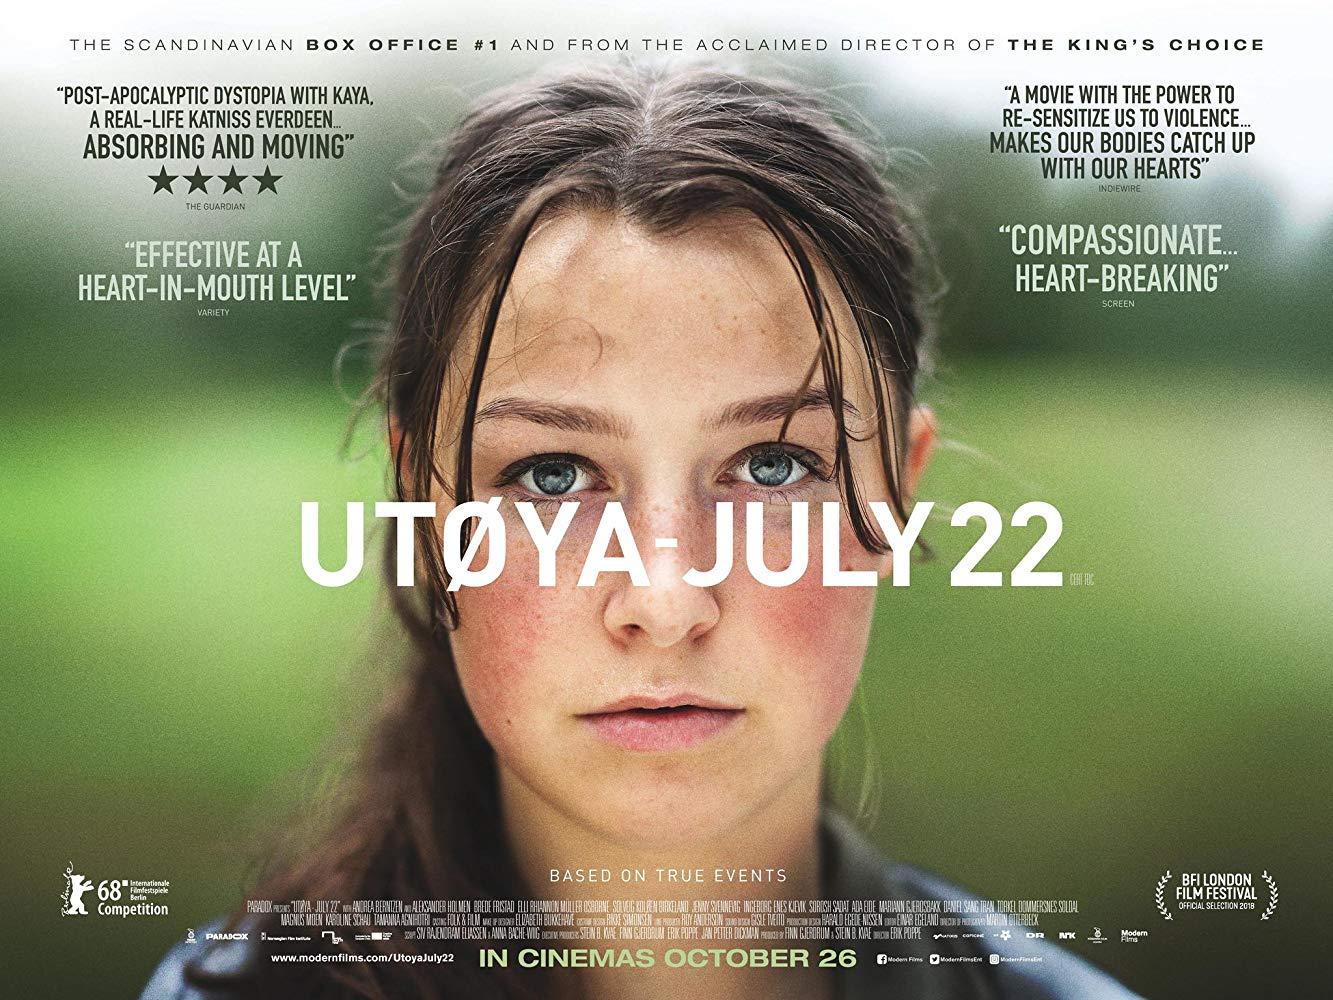 Utøya: July 22 (Utøya 22. juli) [Sub: Eng]